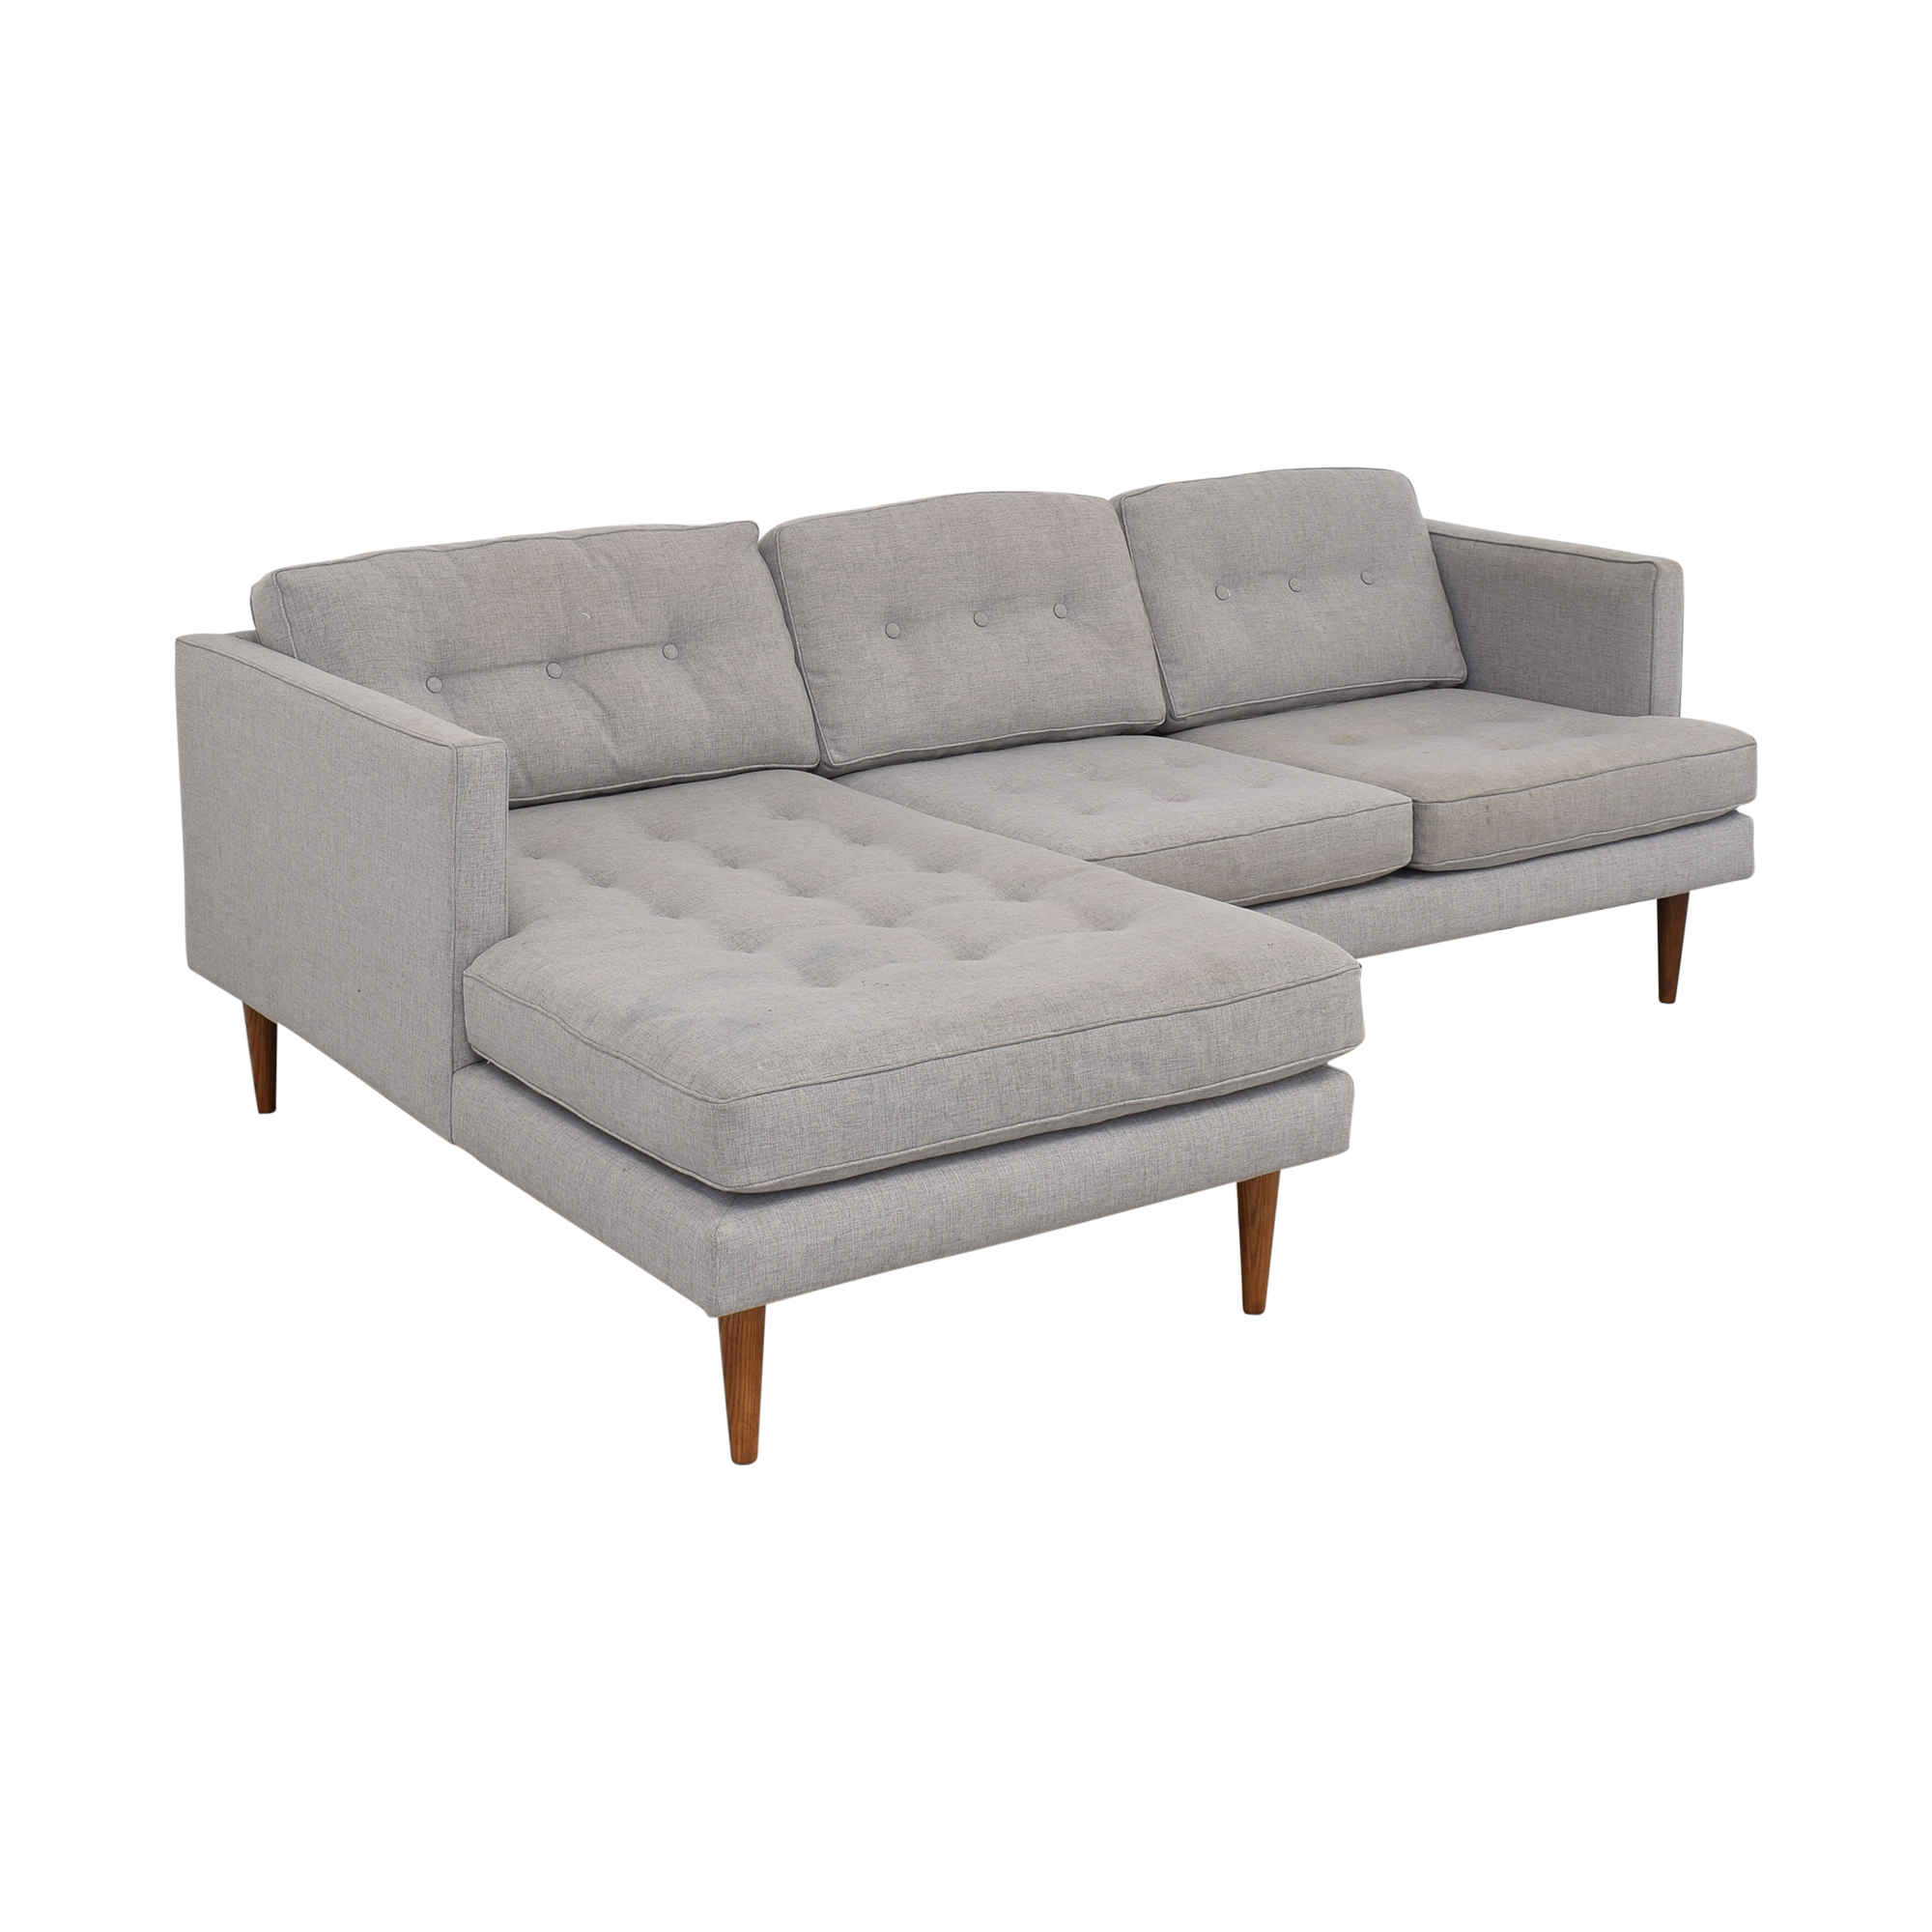 West Elm West Elm Peggy Mid-Century Chaise Sectional Sofa ma